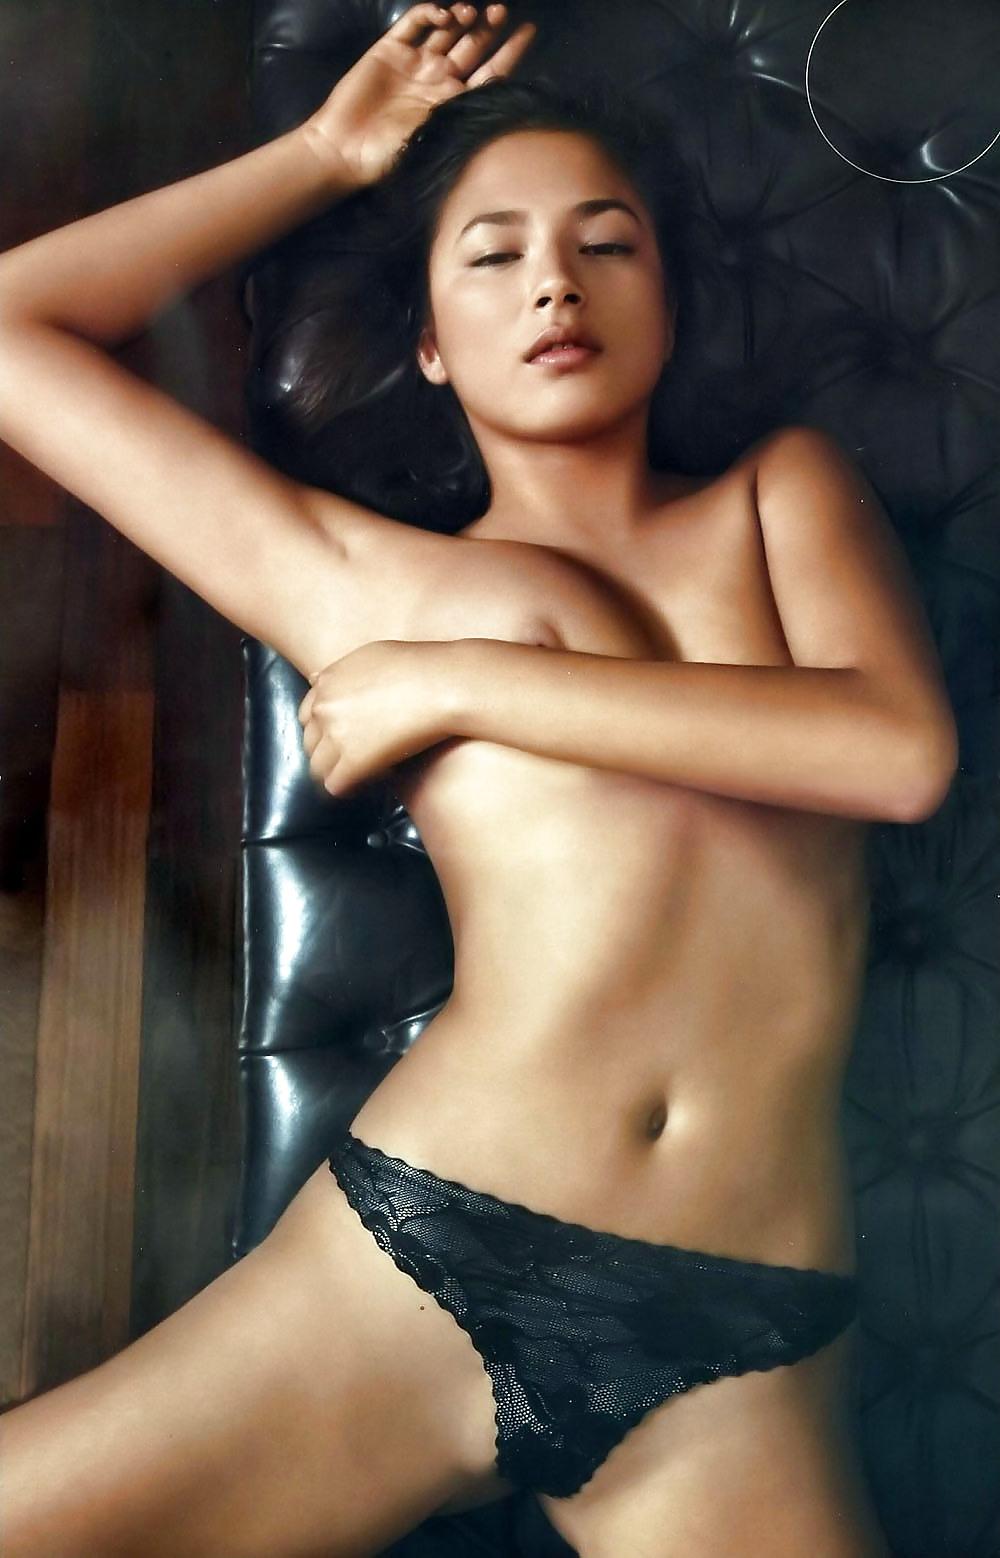 Hot indian girls nude tumblr